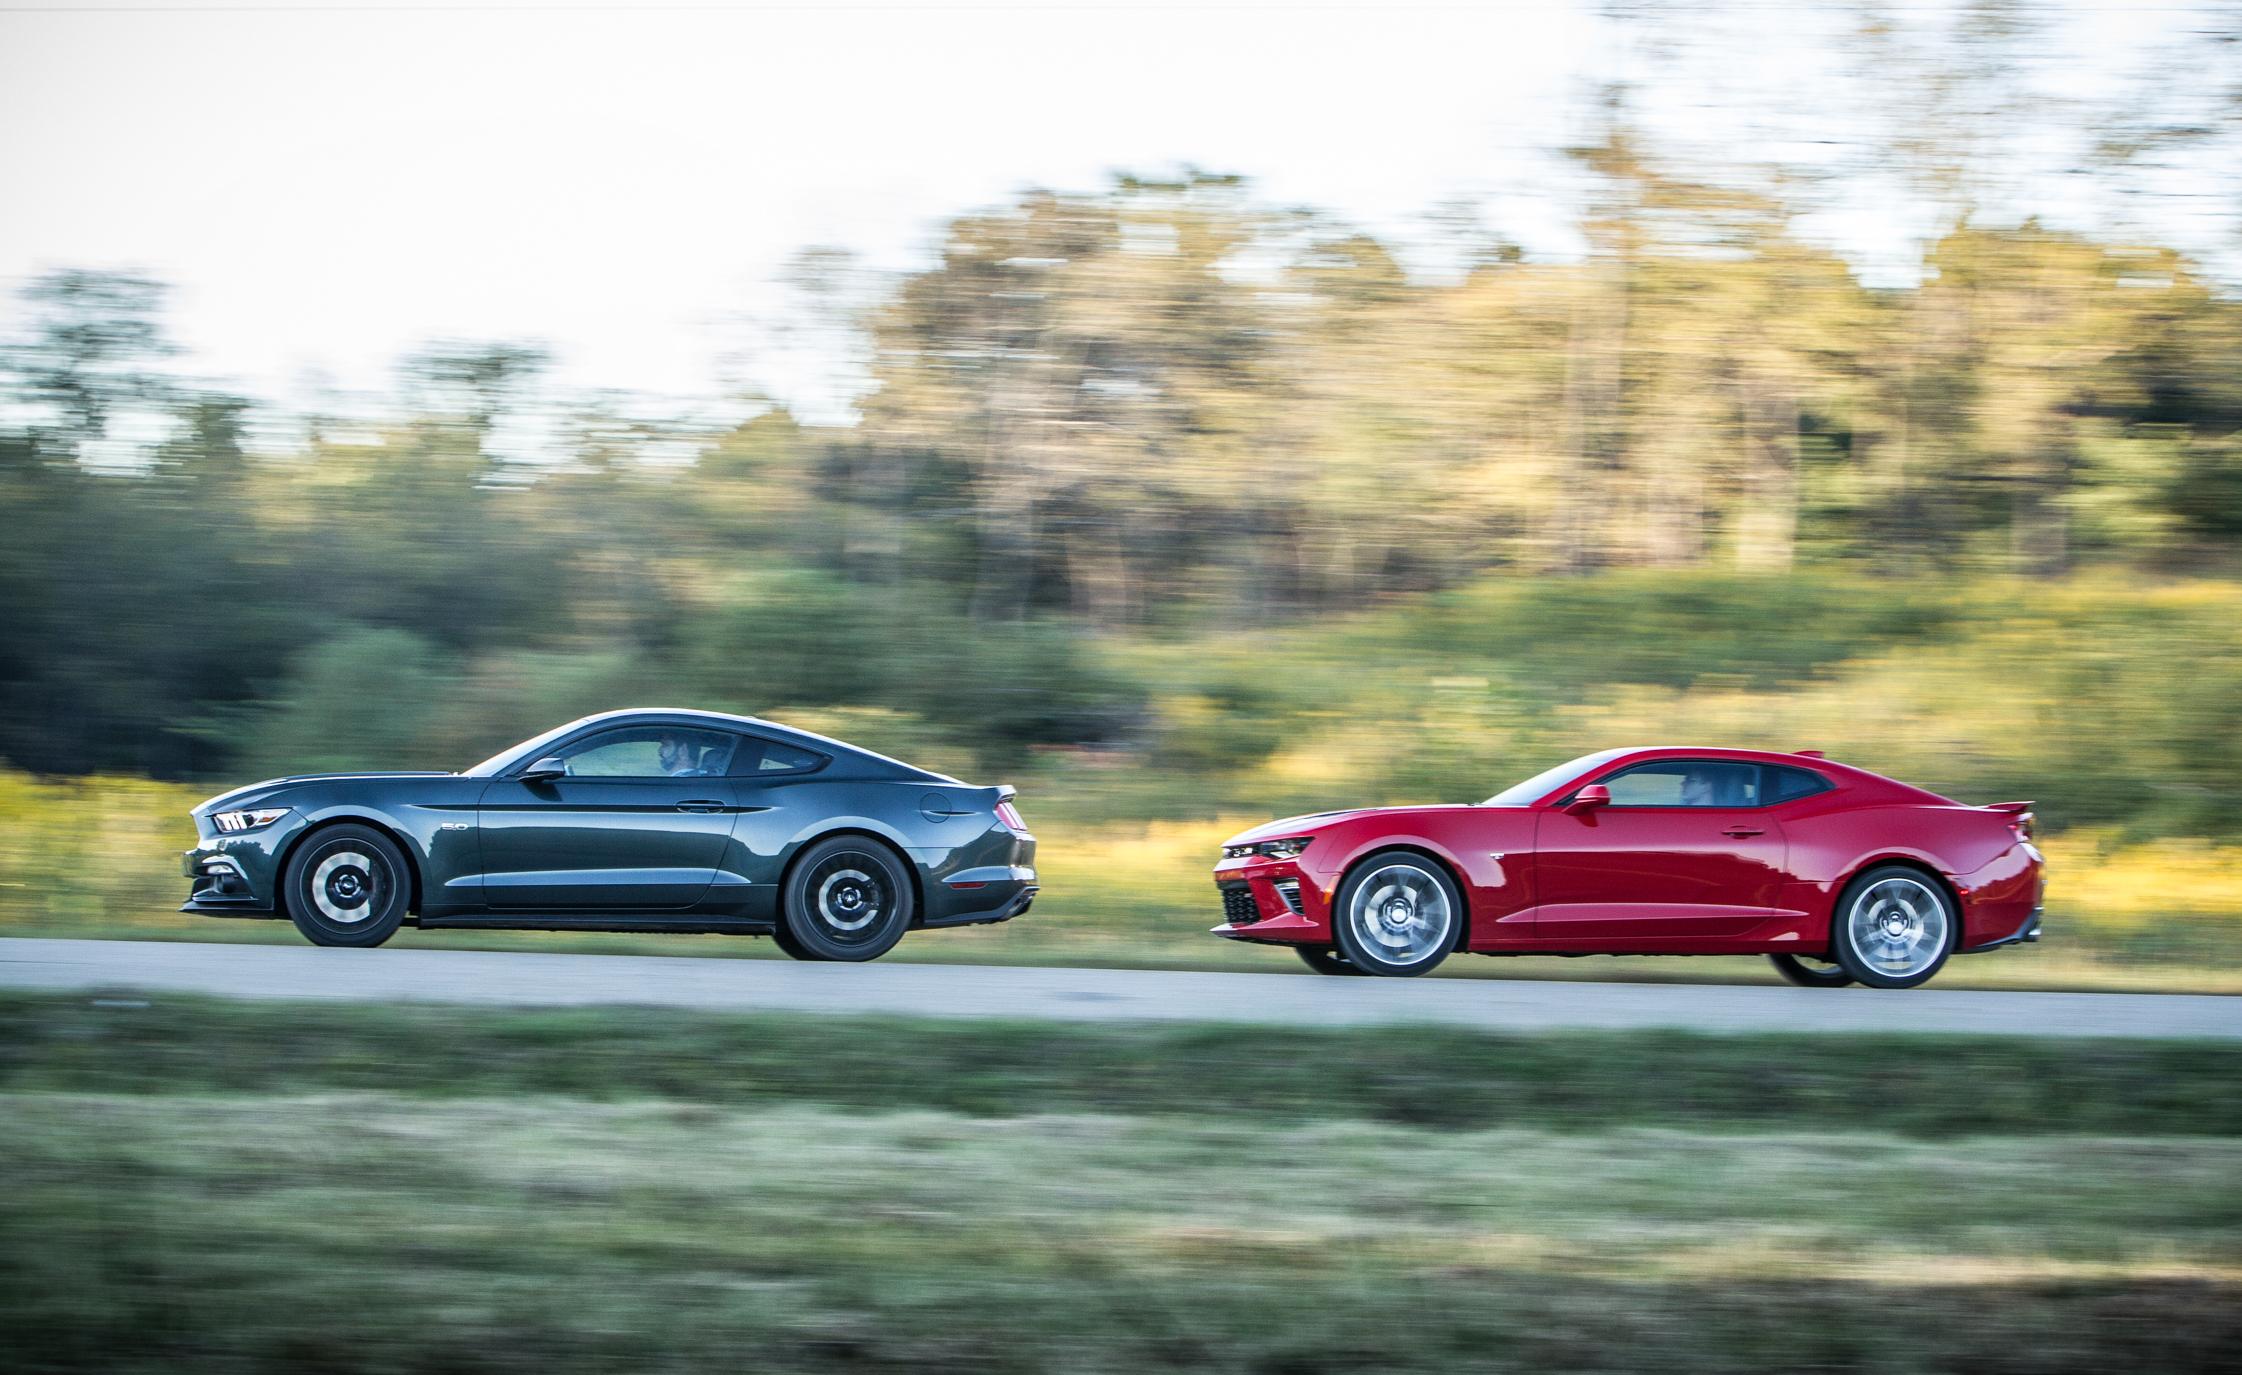 2016 Chevrolet Camaro Ss Vs 2015 Ford Mustang Gt Comparison 6270